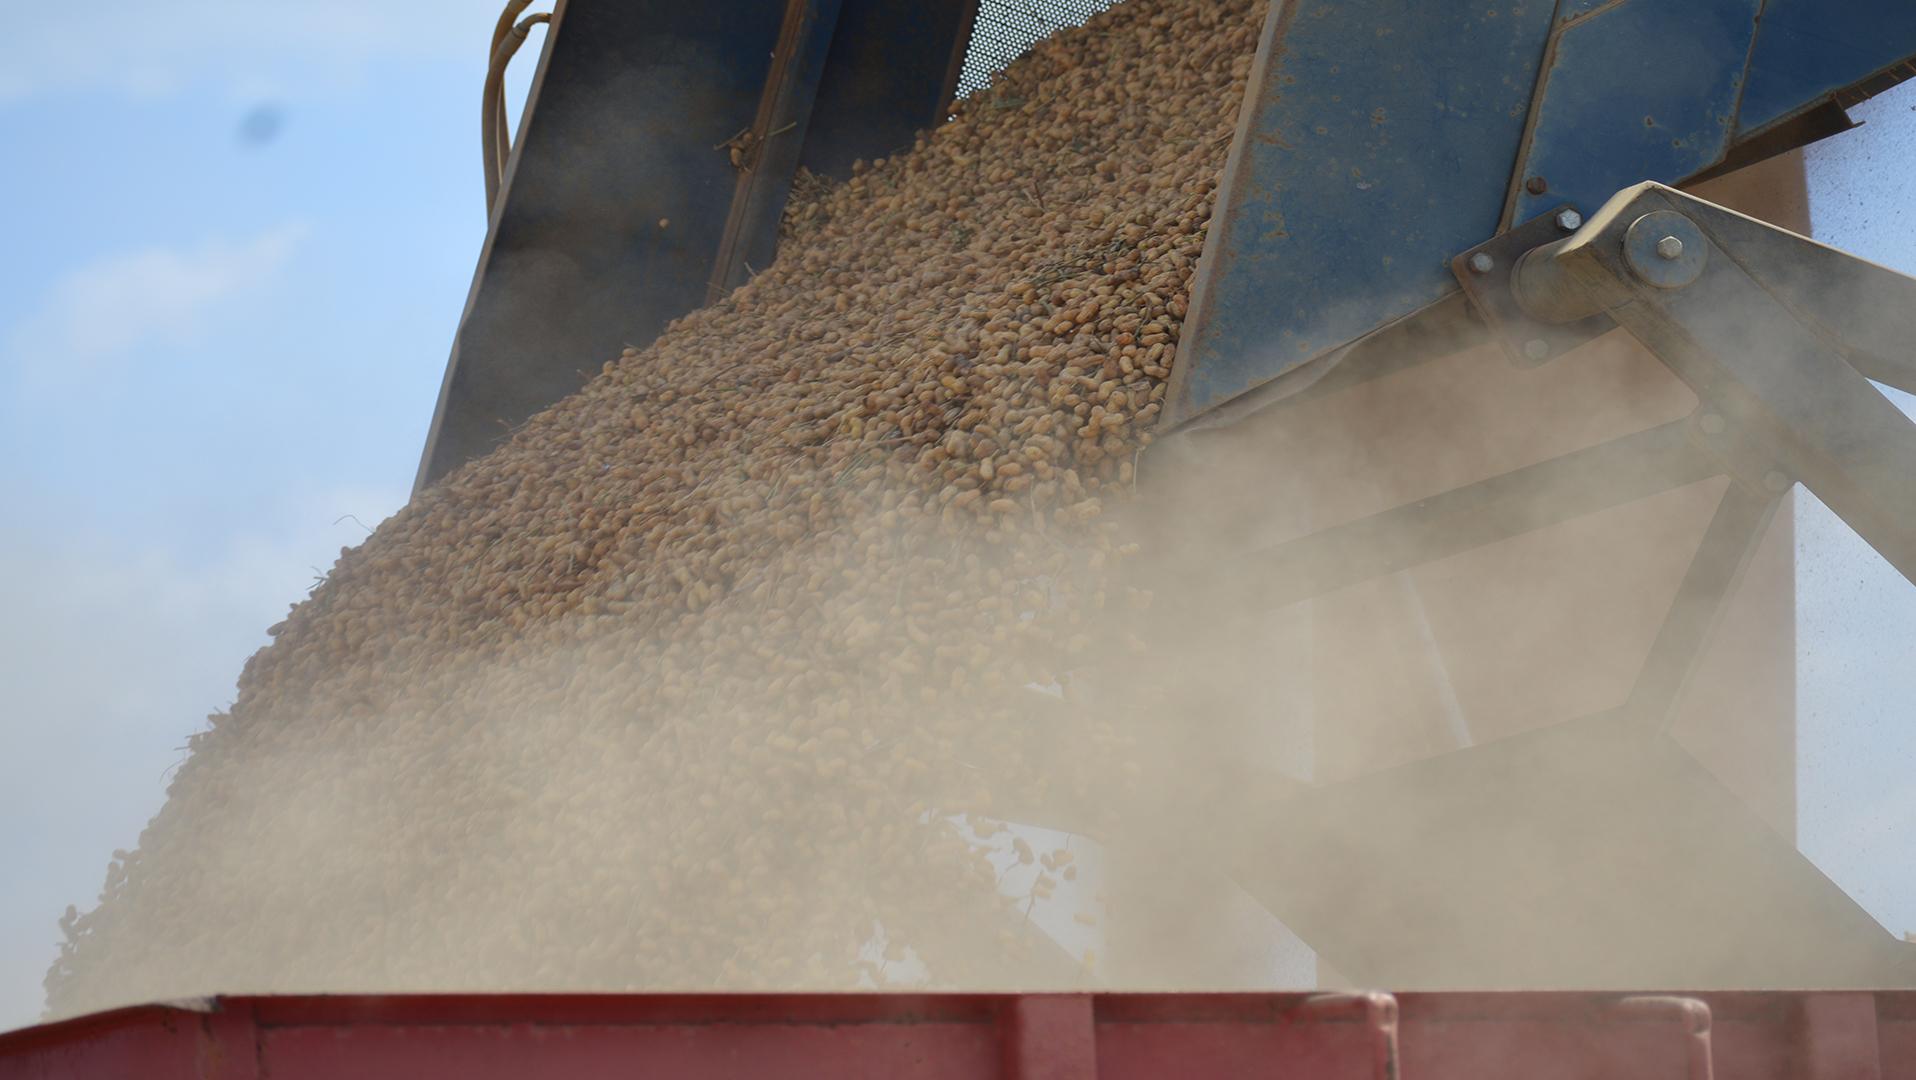 2020 Estimated Peanut Production for Alabama Released